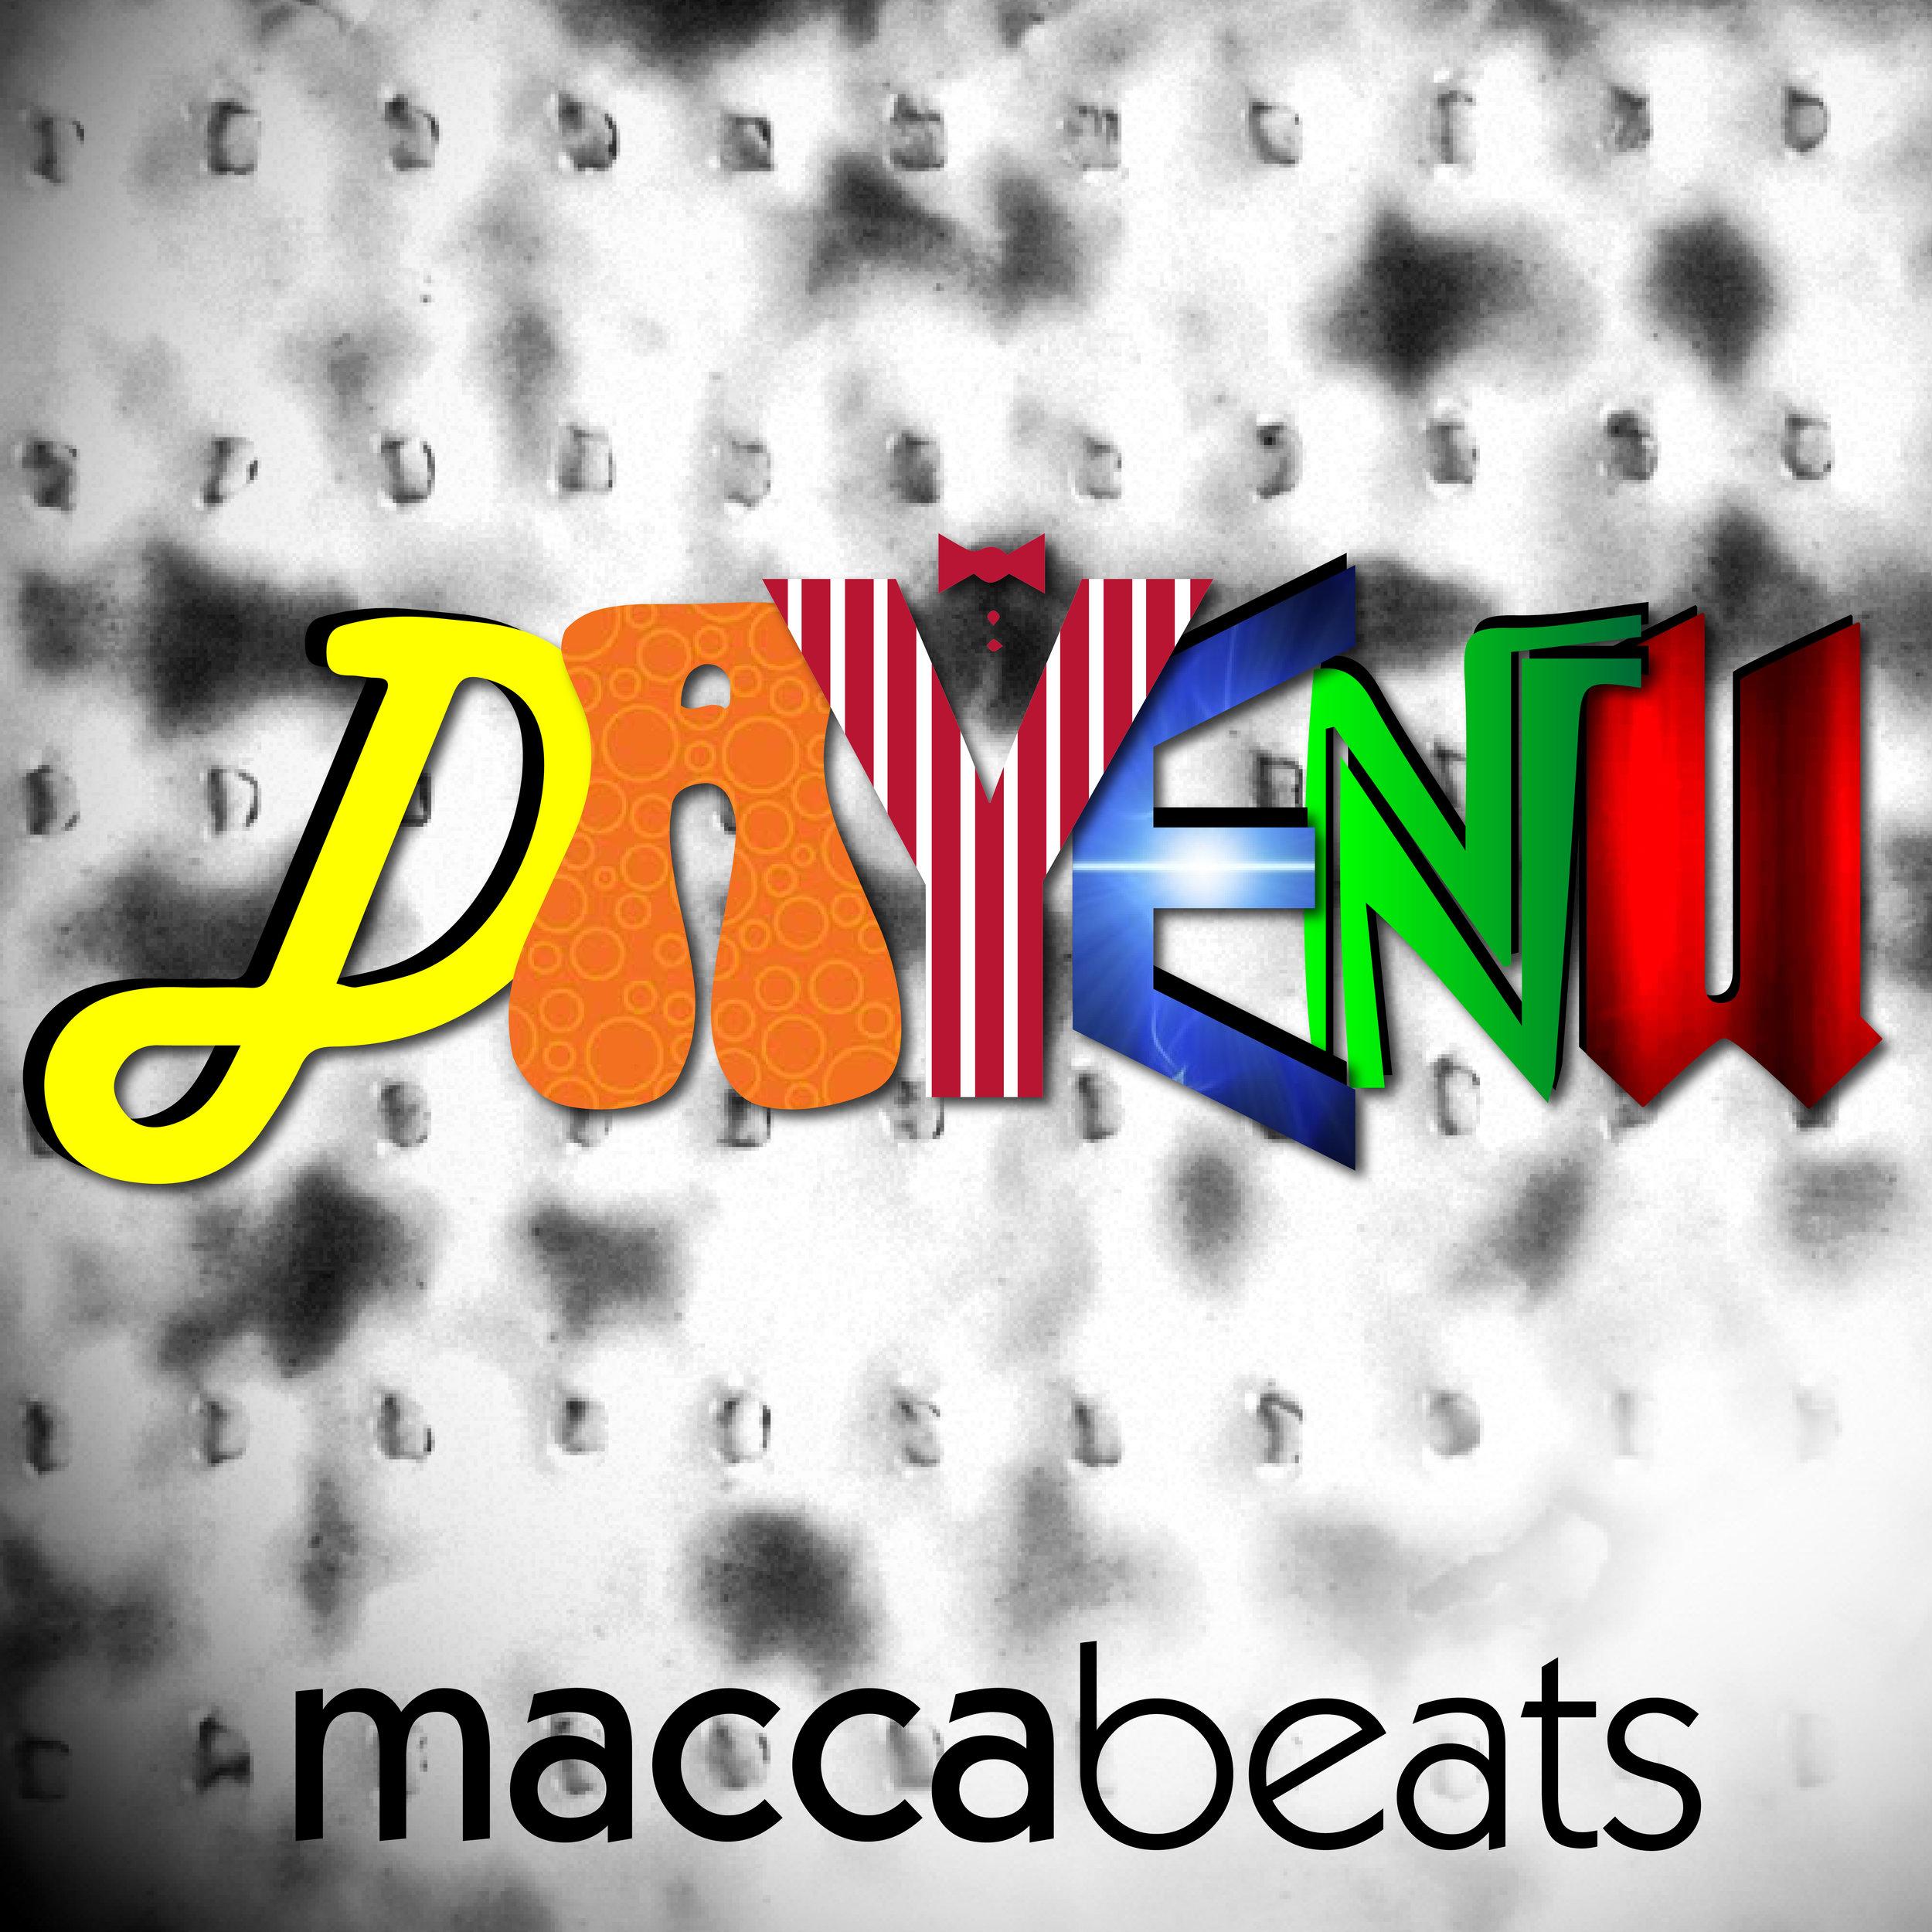 Dayenu - Album Artwork, Maccabeats